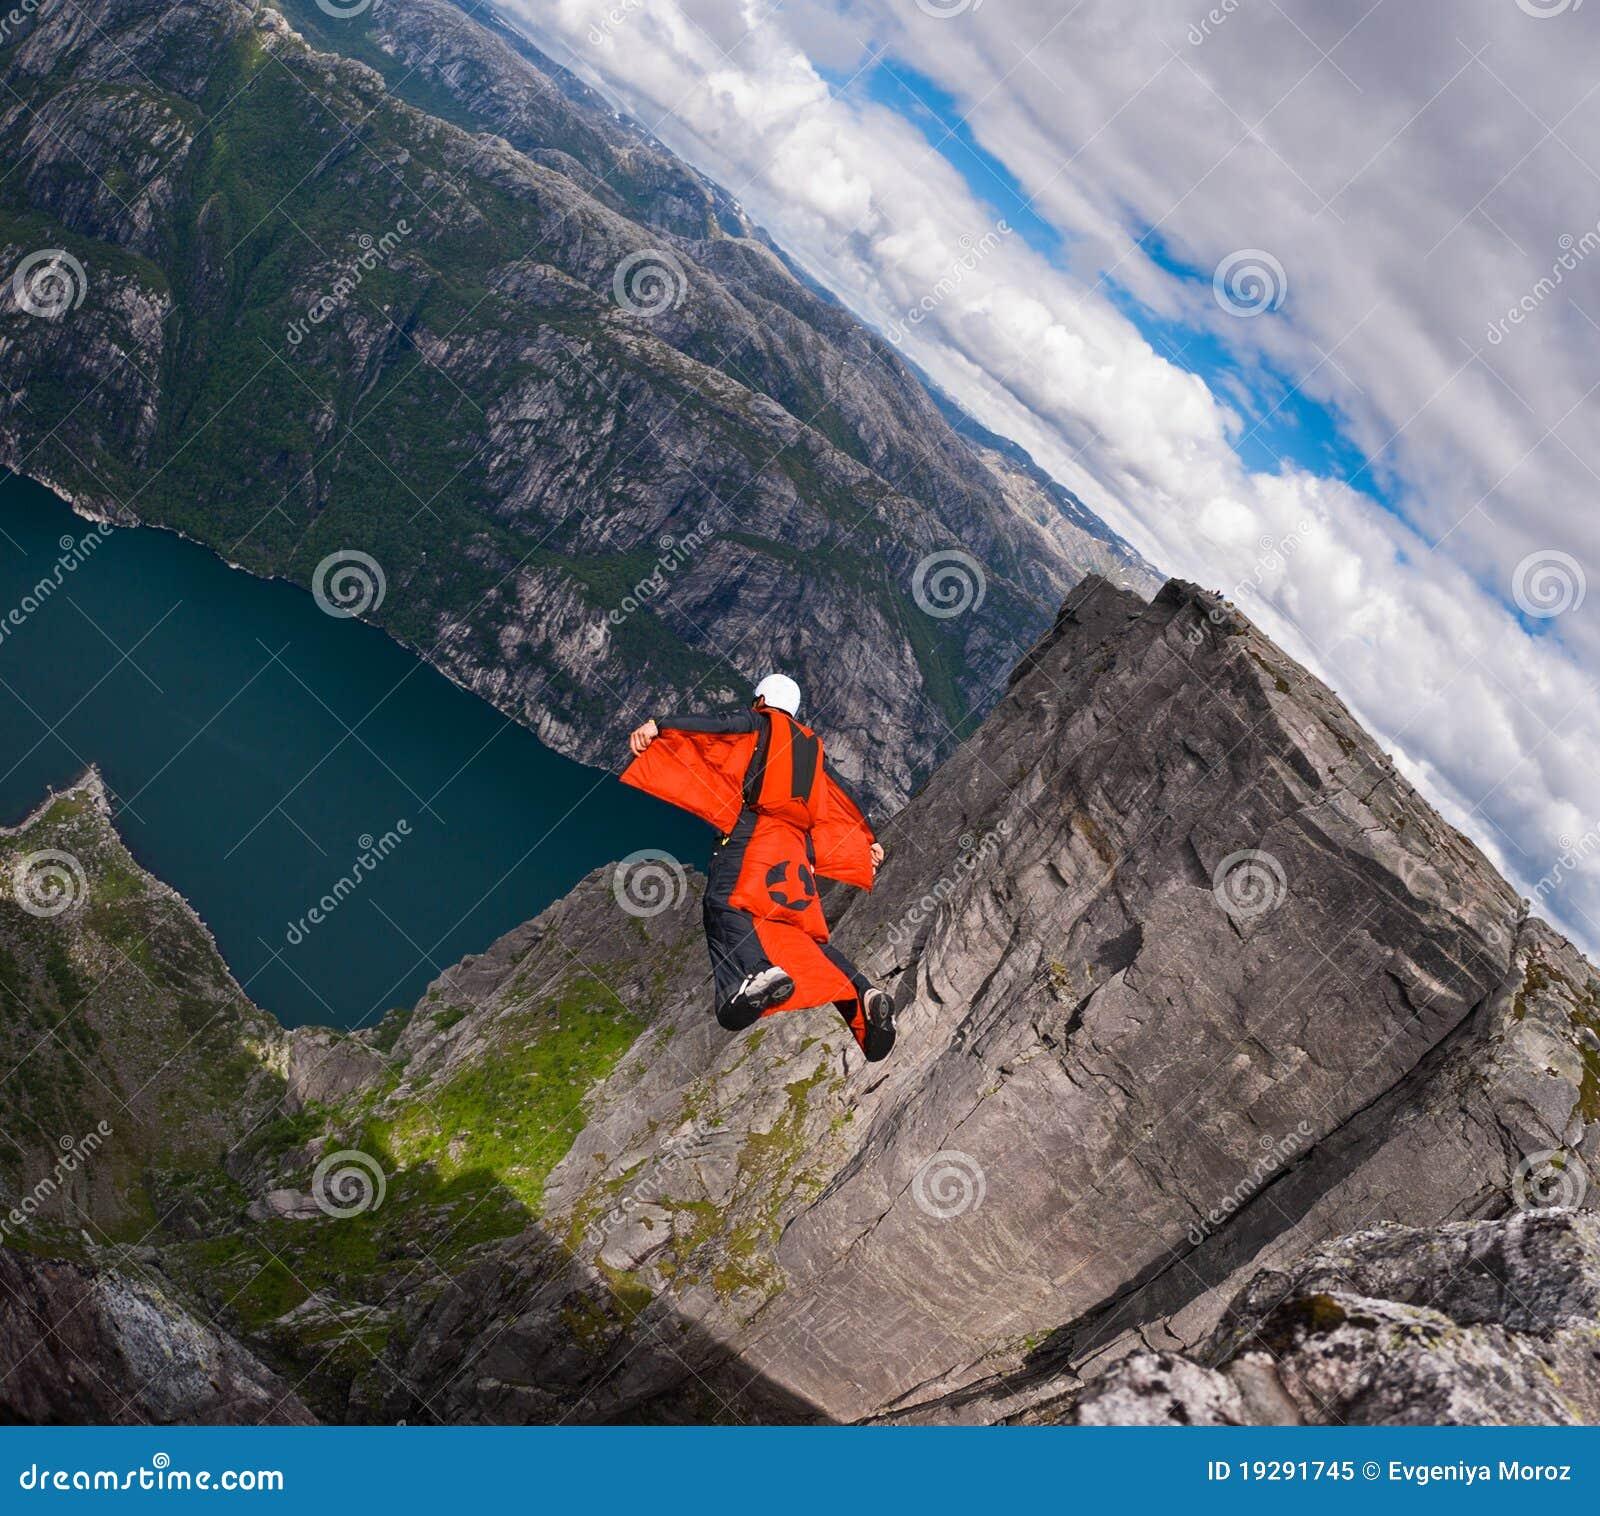 B.A.S.E. jumper in wingsuit jumps at Kjerag